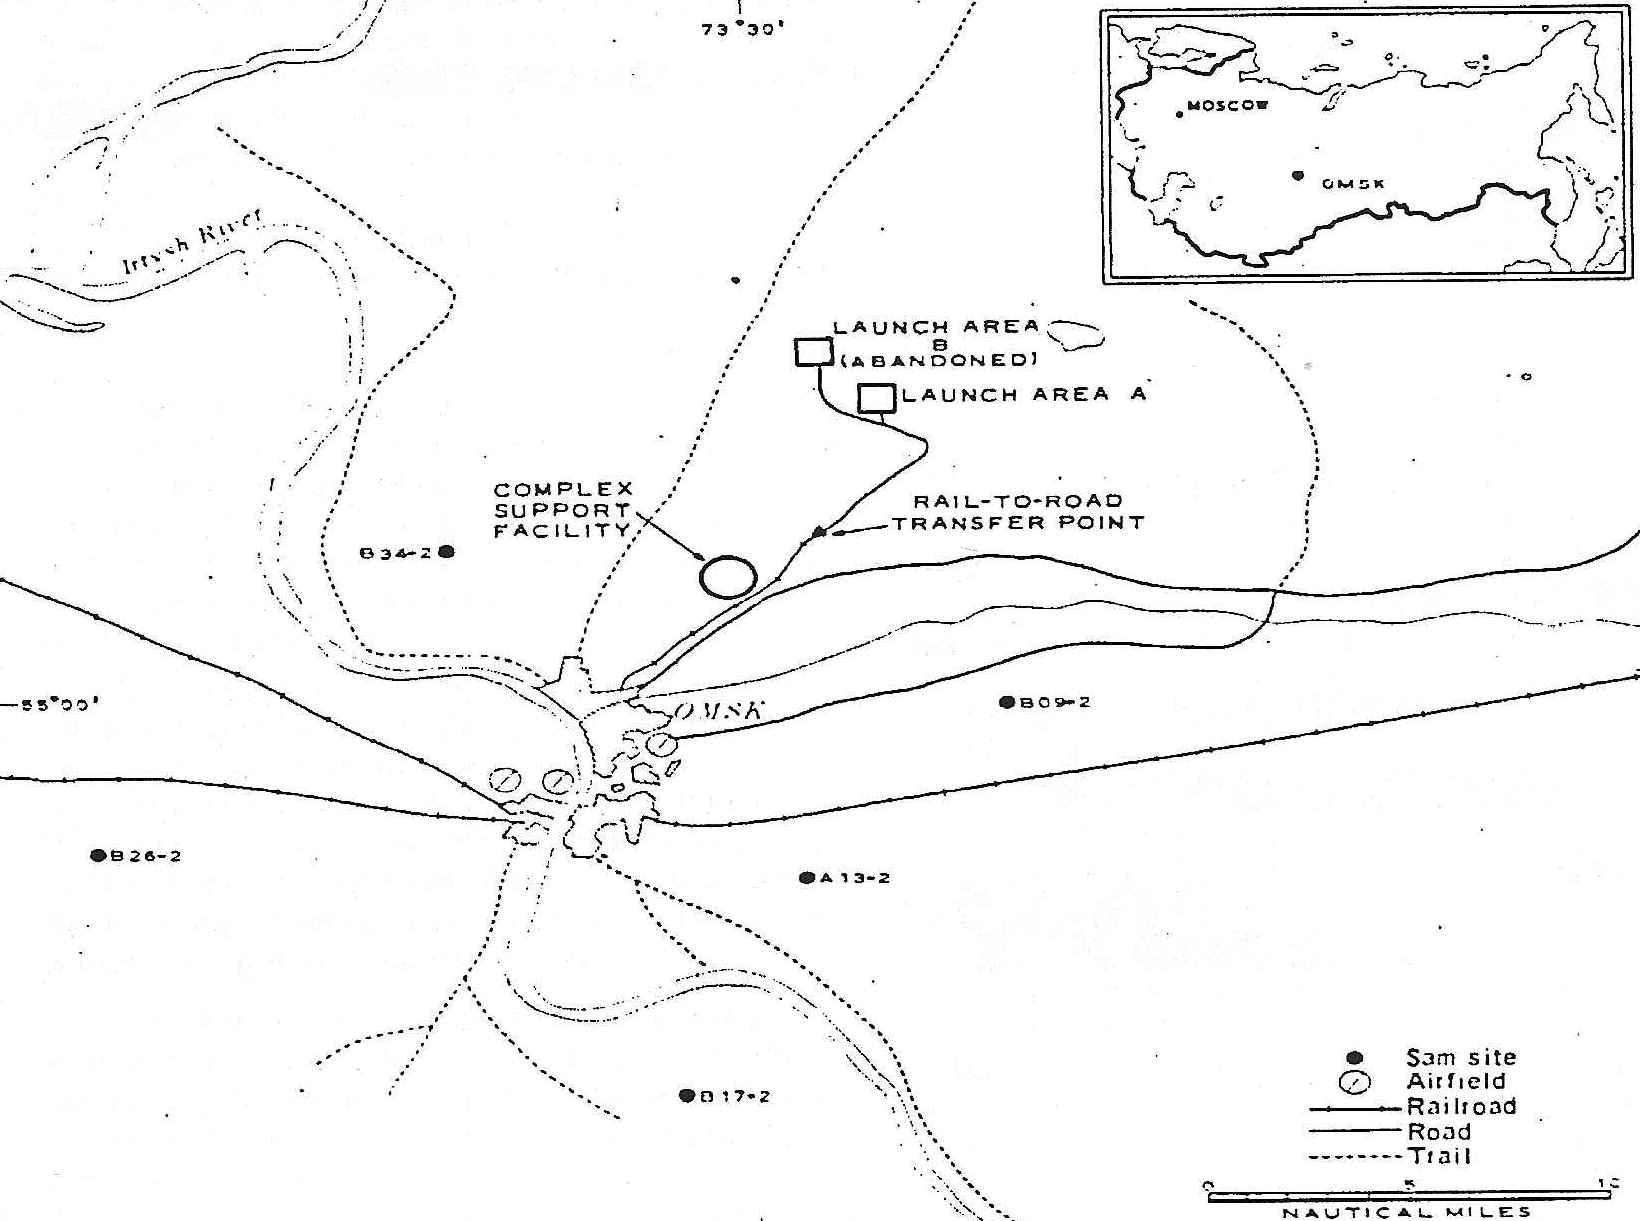 290th Missile Regiment